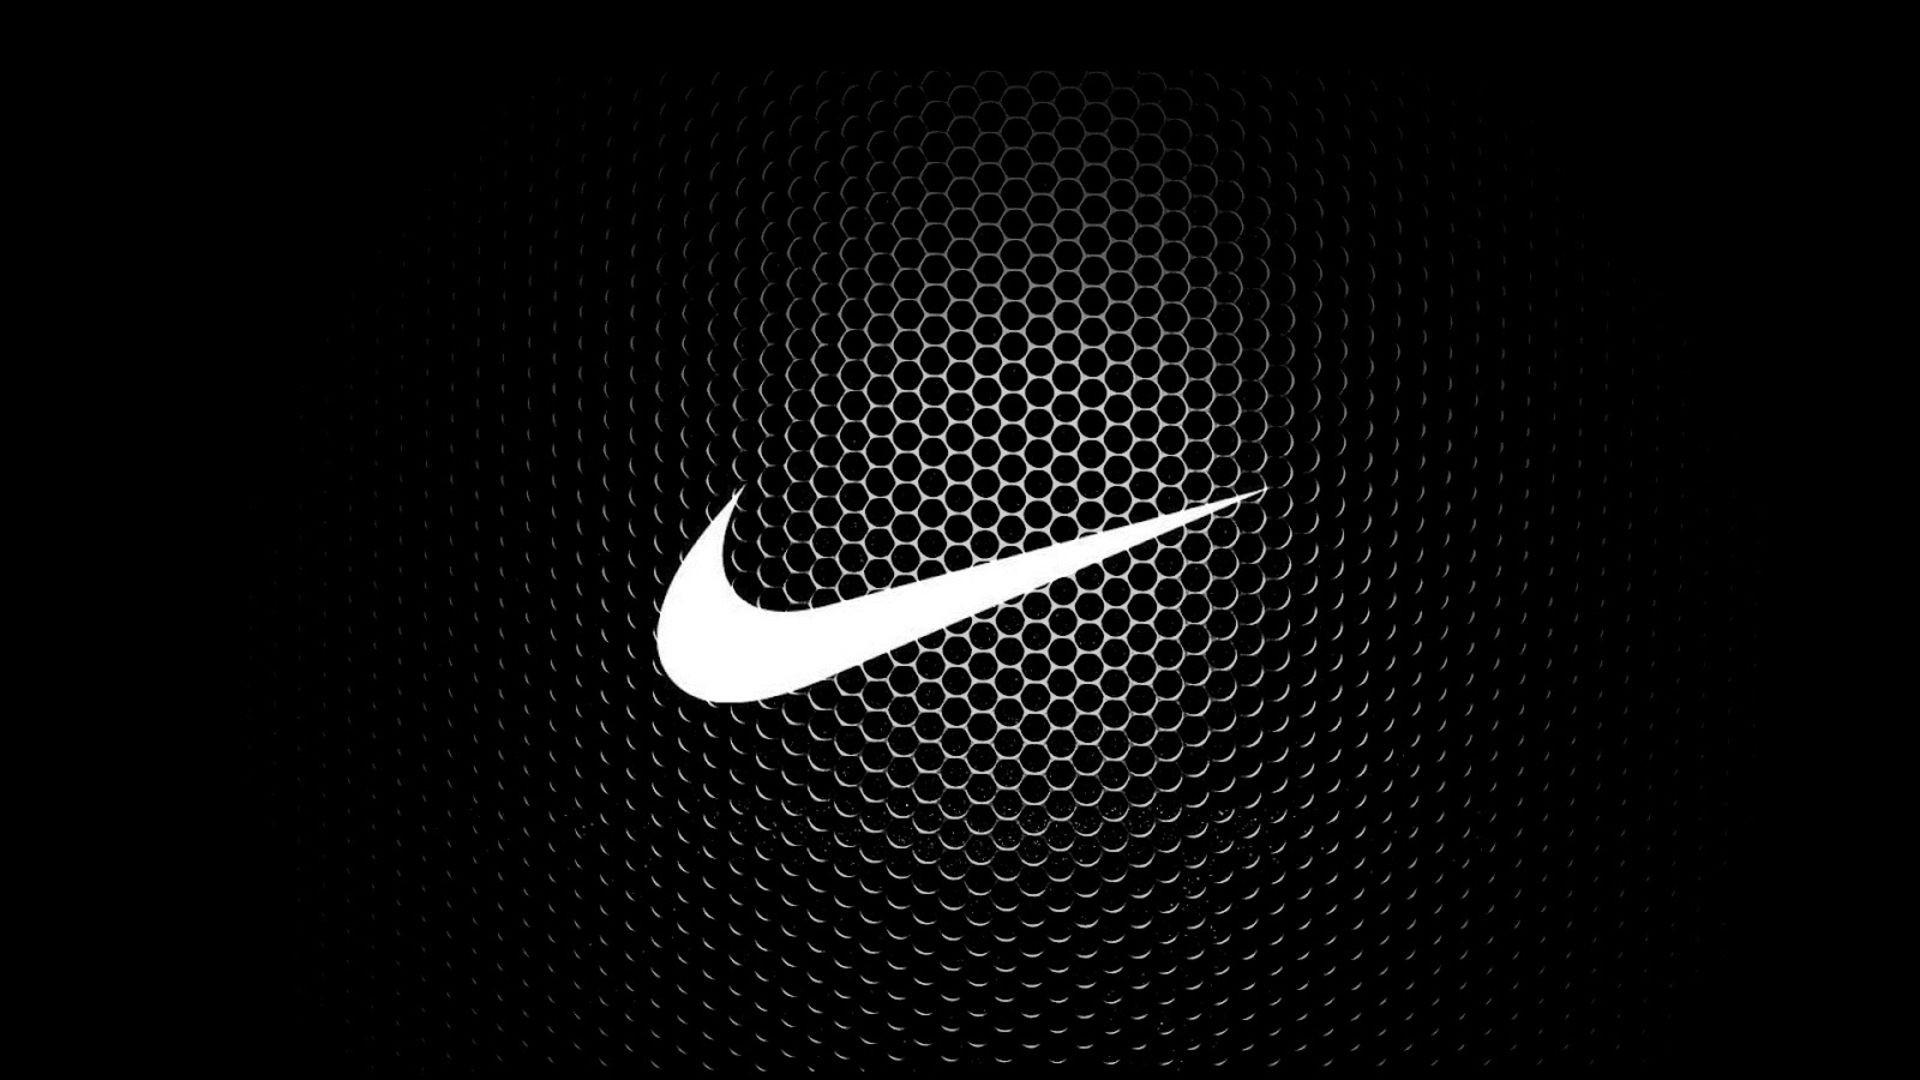 Nike Background Yeterwpartco